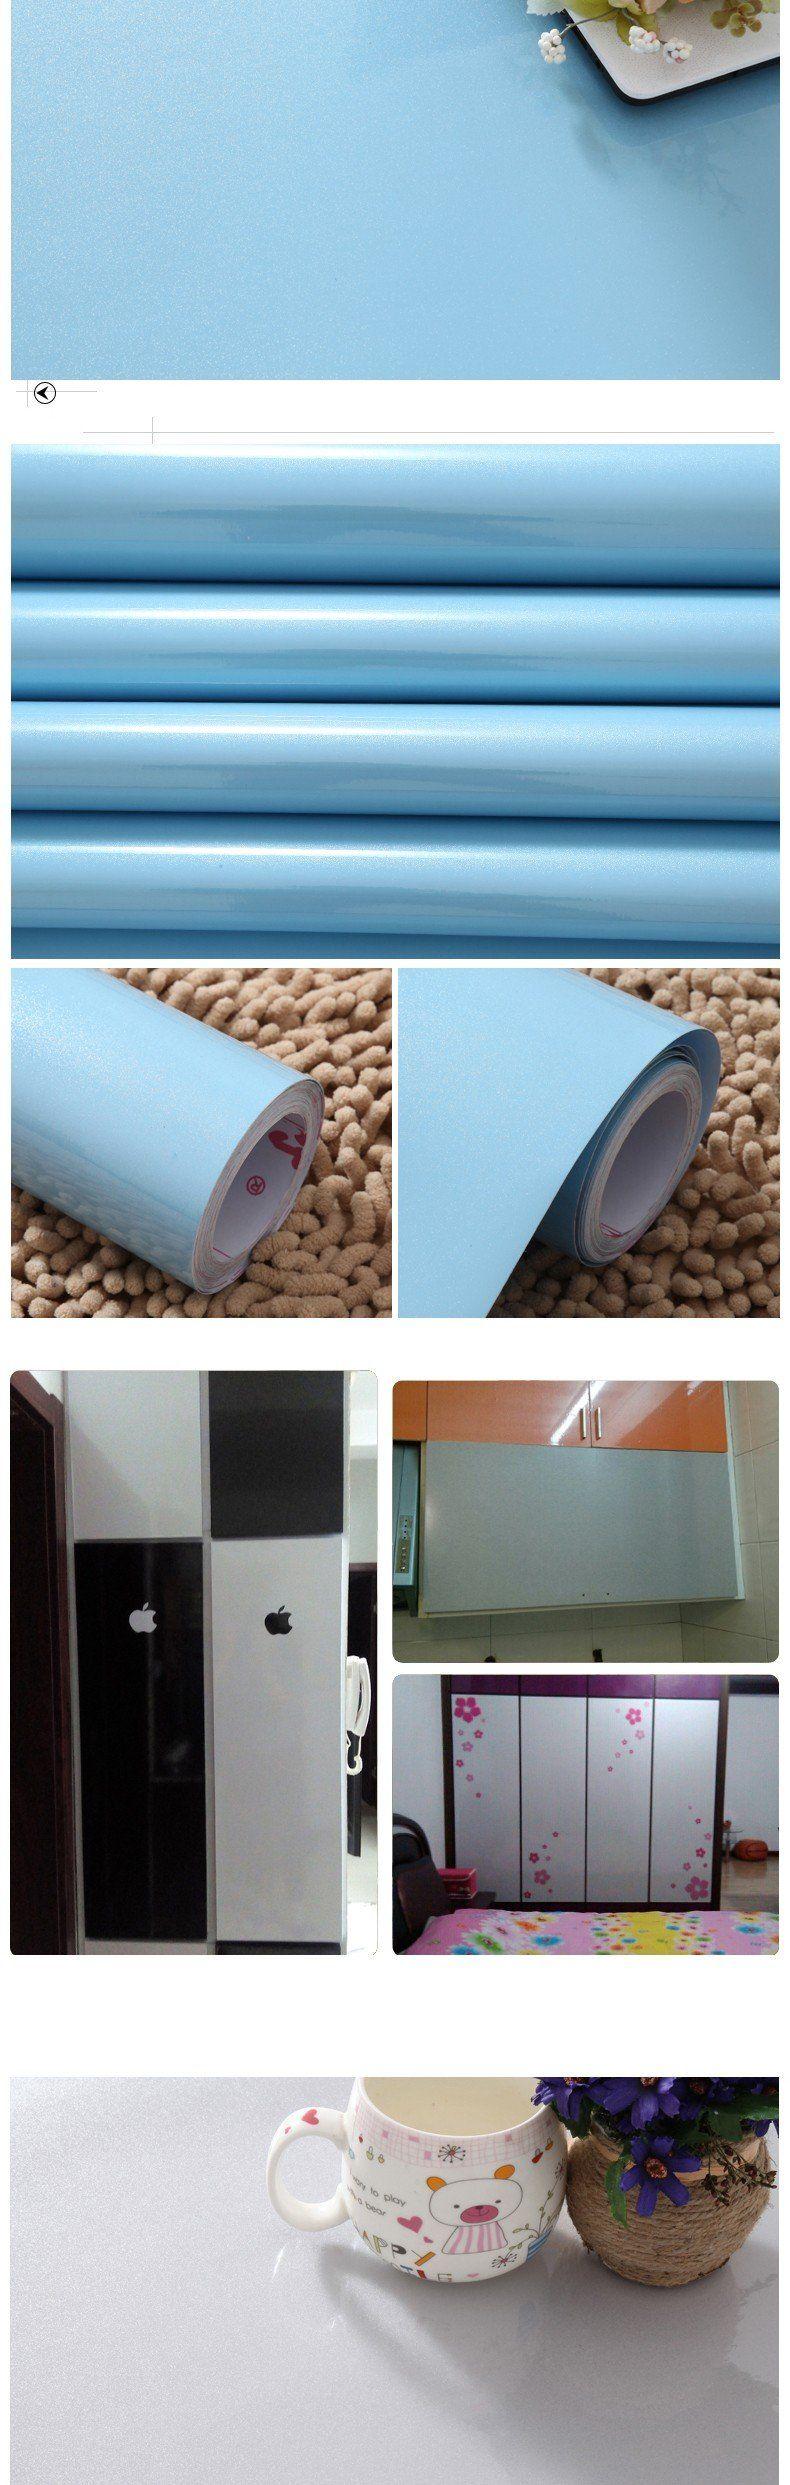 Waterproof vinyl decorative film self adhesive wallpaper